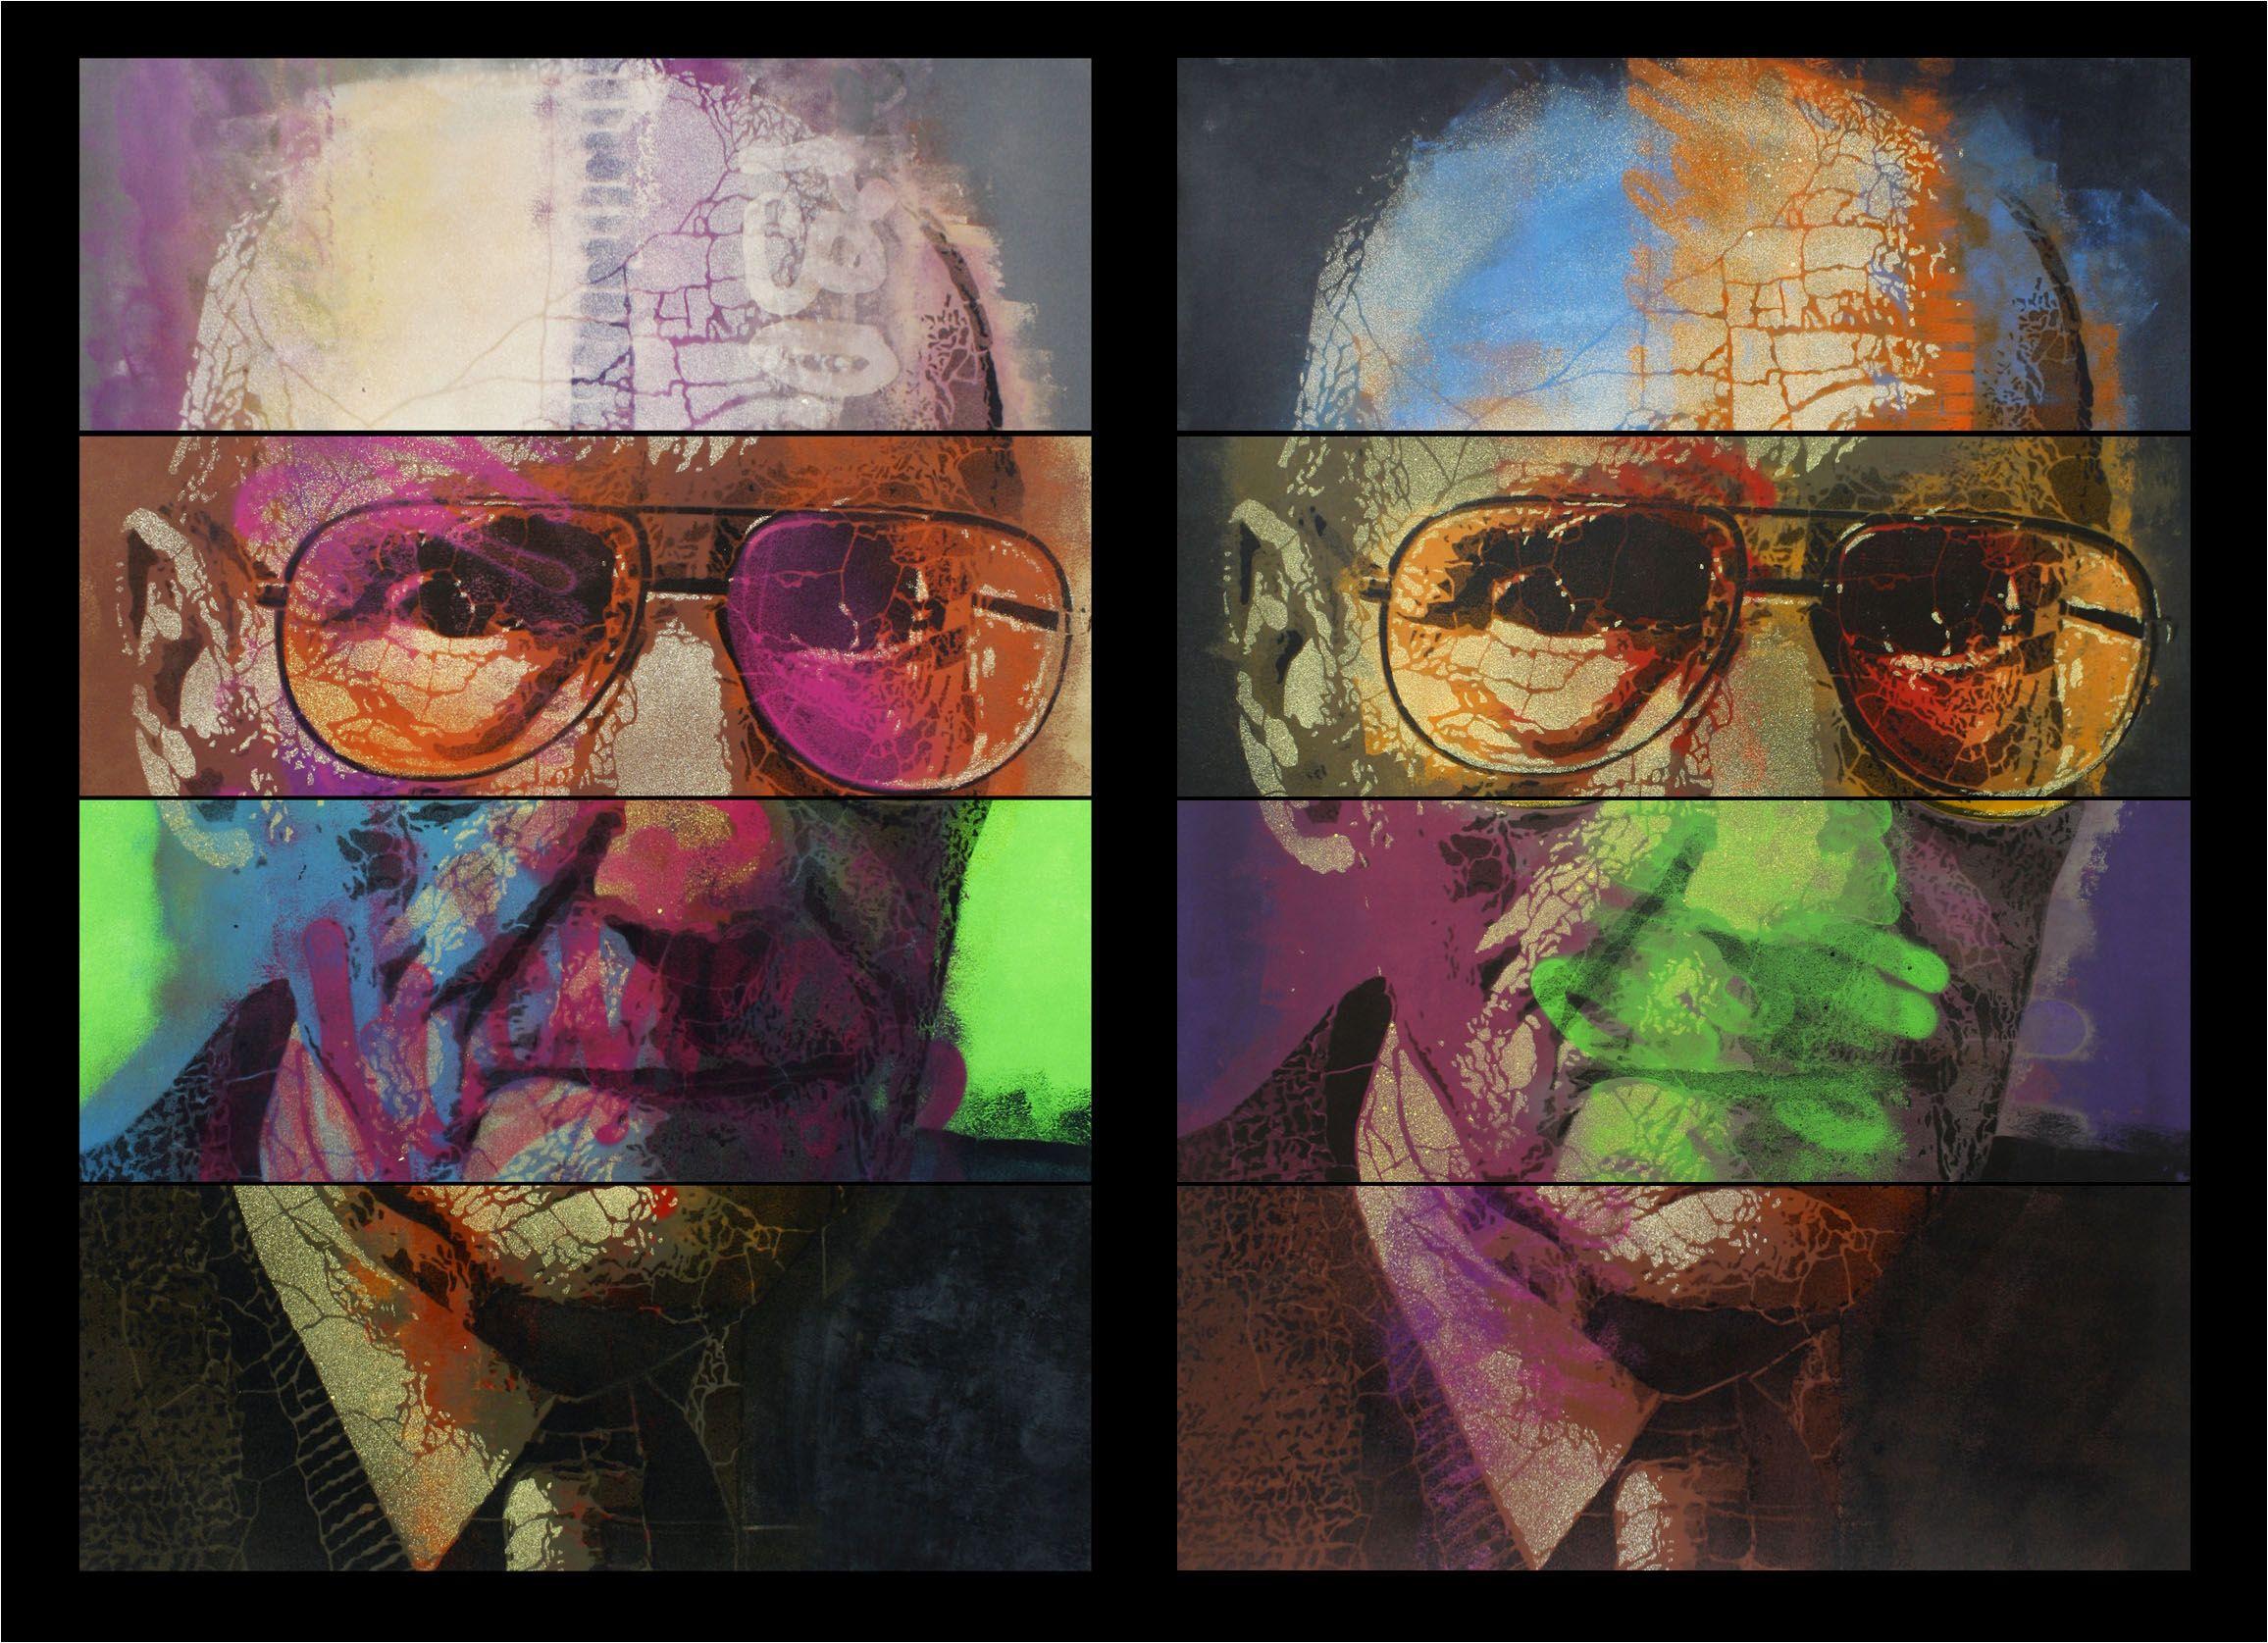 Williams Burroughs  portfolio of 15 original on paper, size 70x100, soon